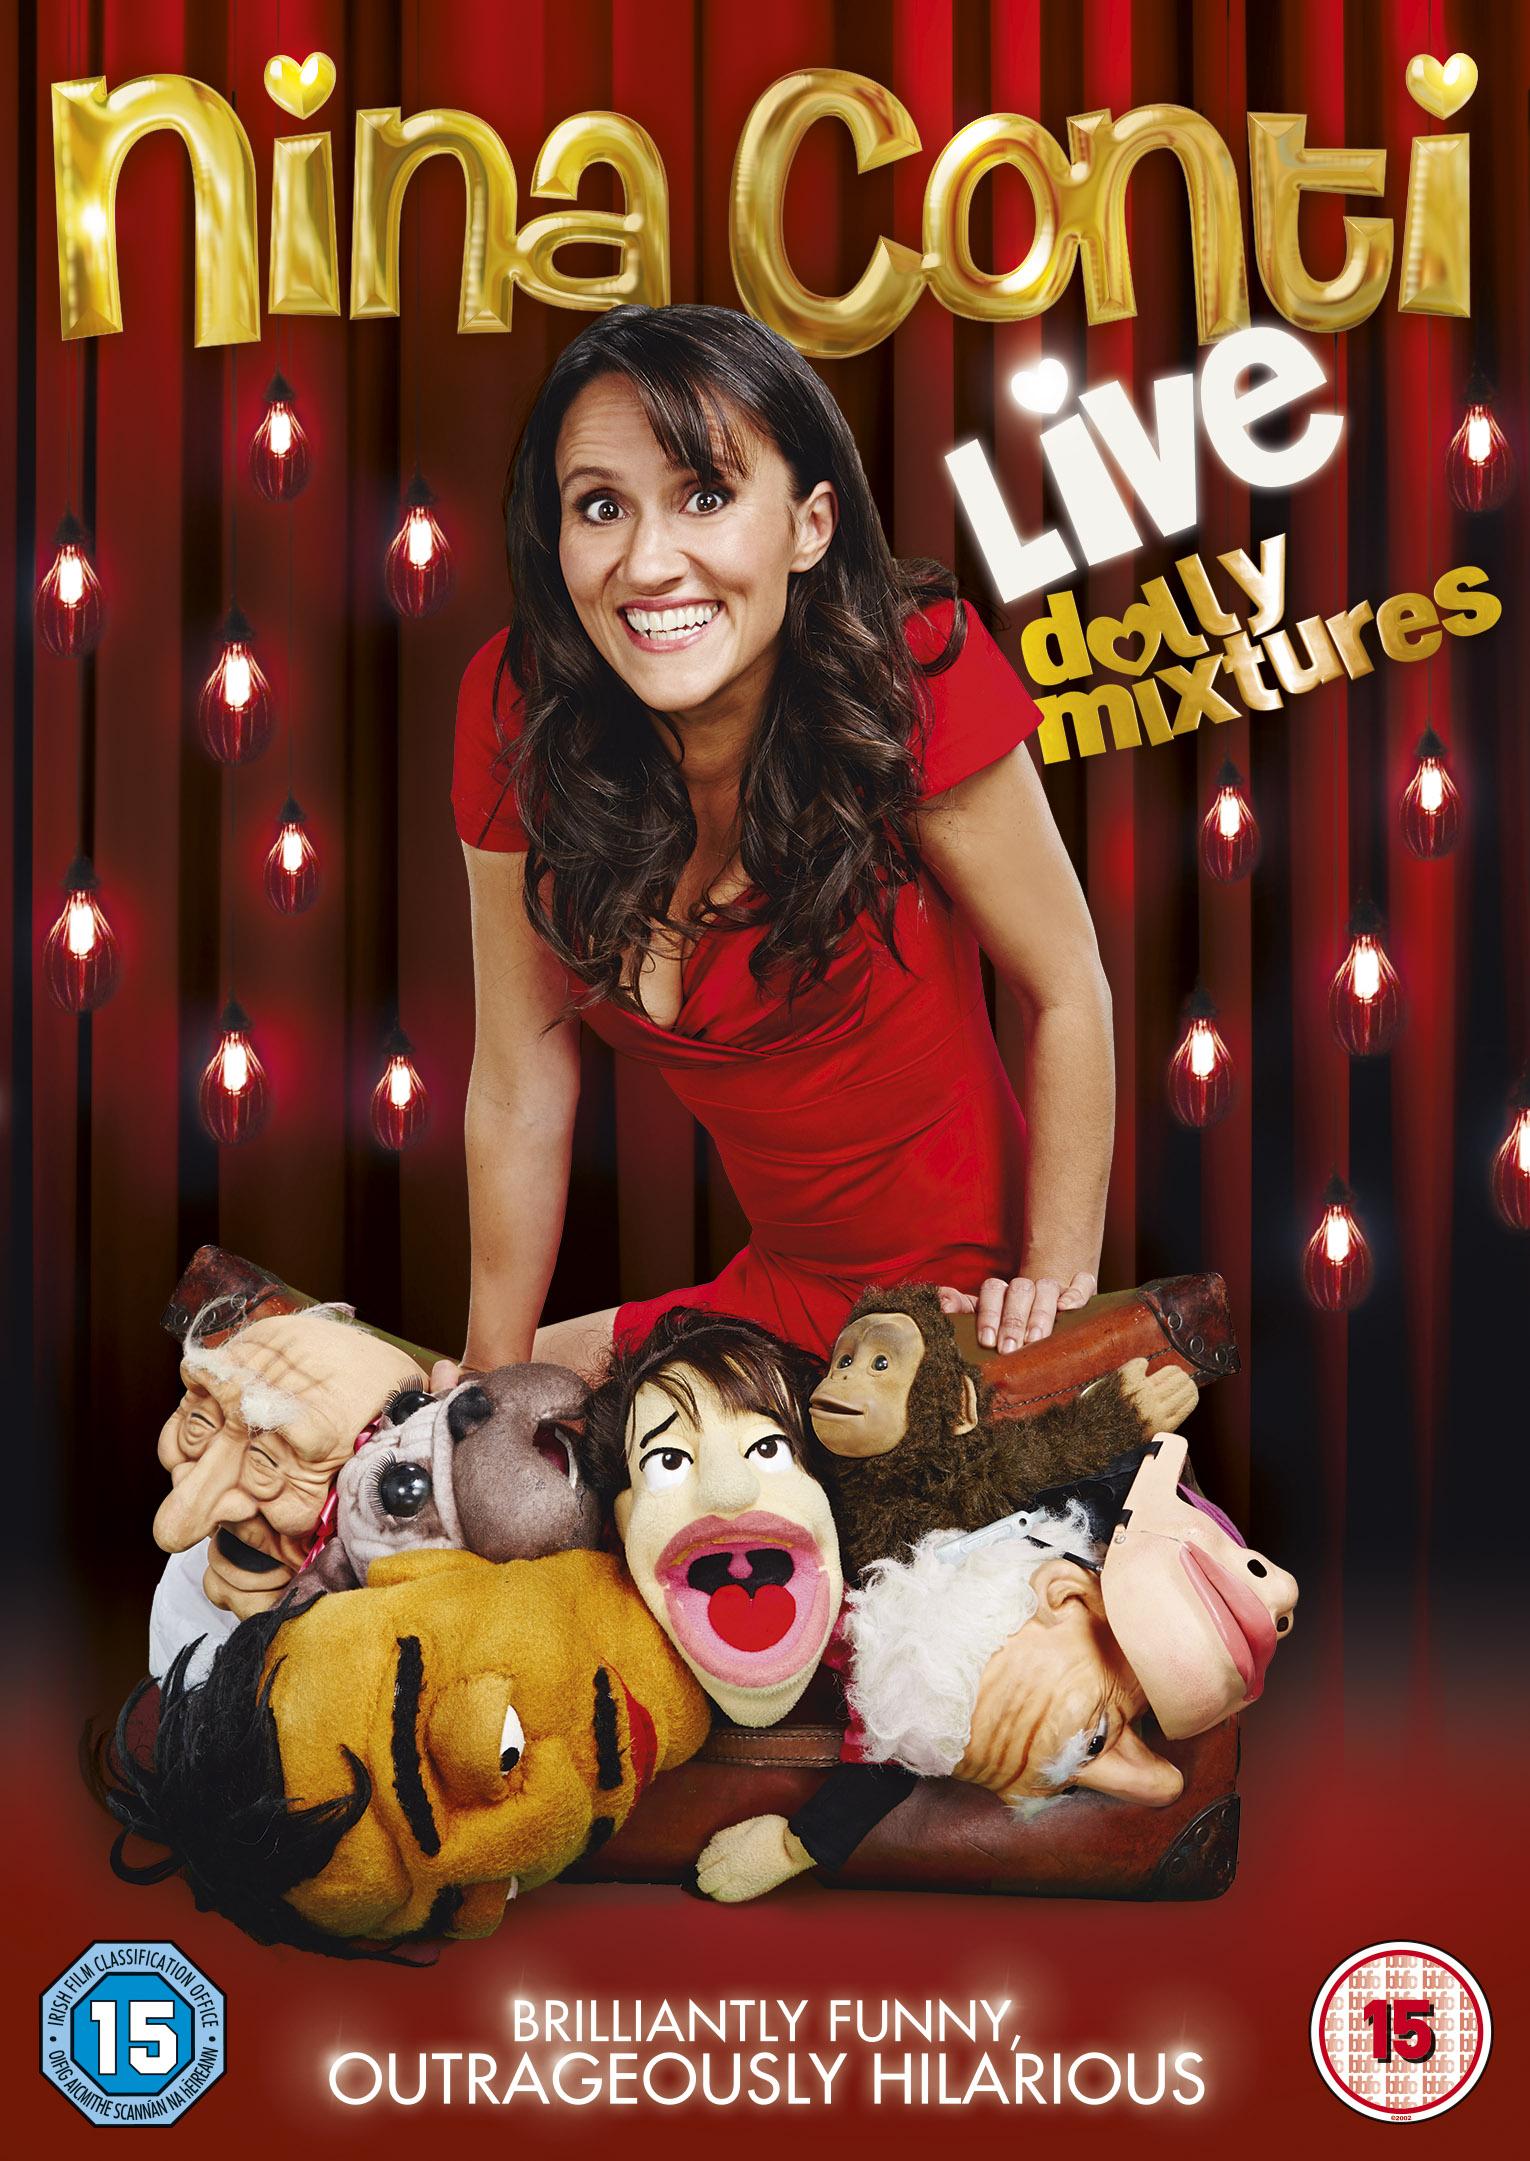 Review: Nina Conti Live – Dolly Mixtures